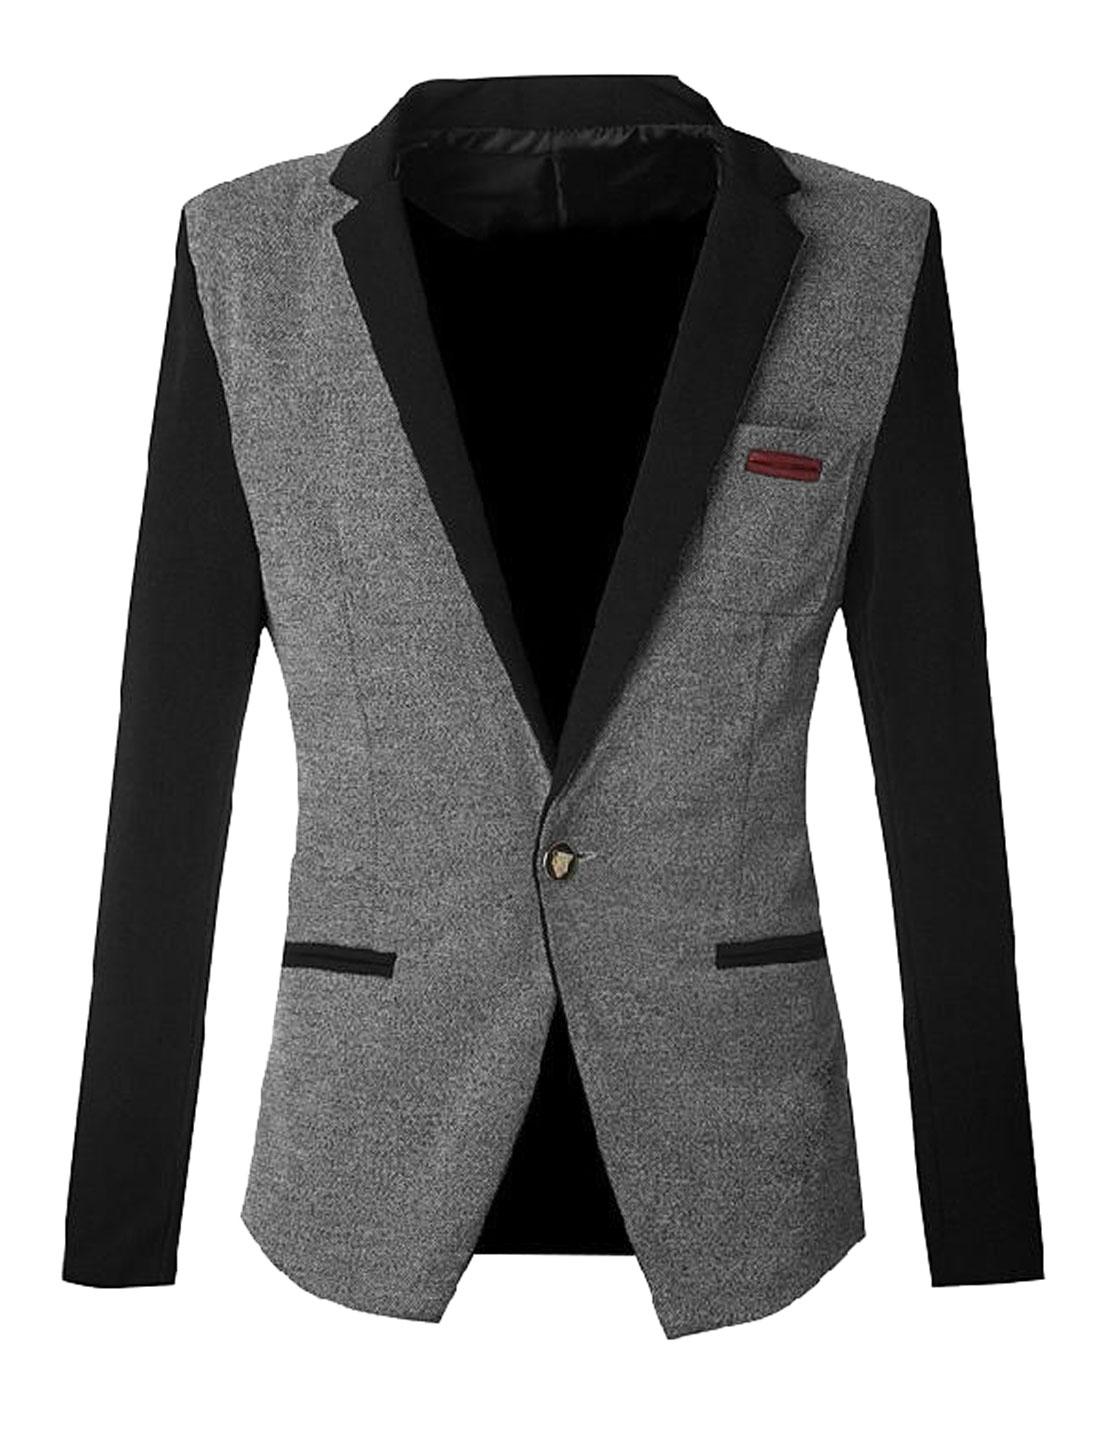 Men Color Block One Button Closure Casual Blazer Jacket Light Gray Black S